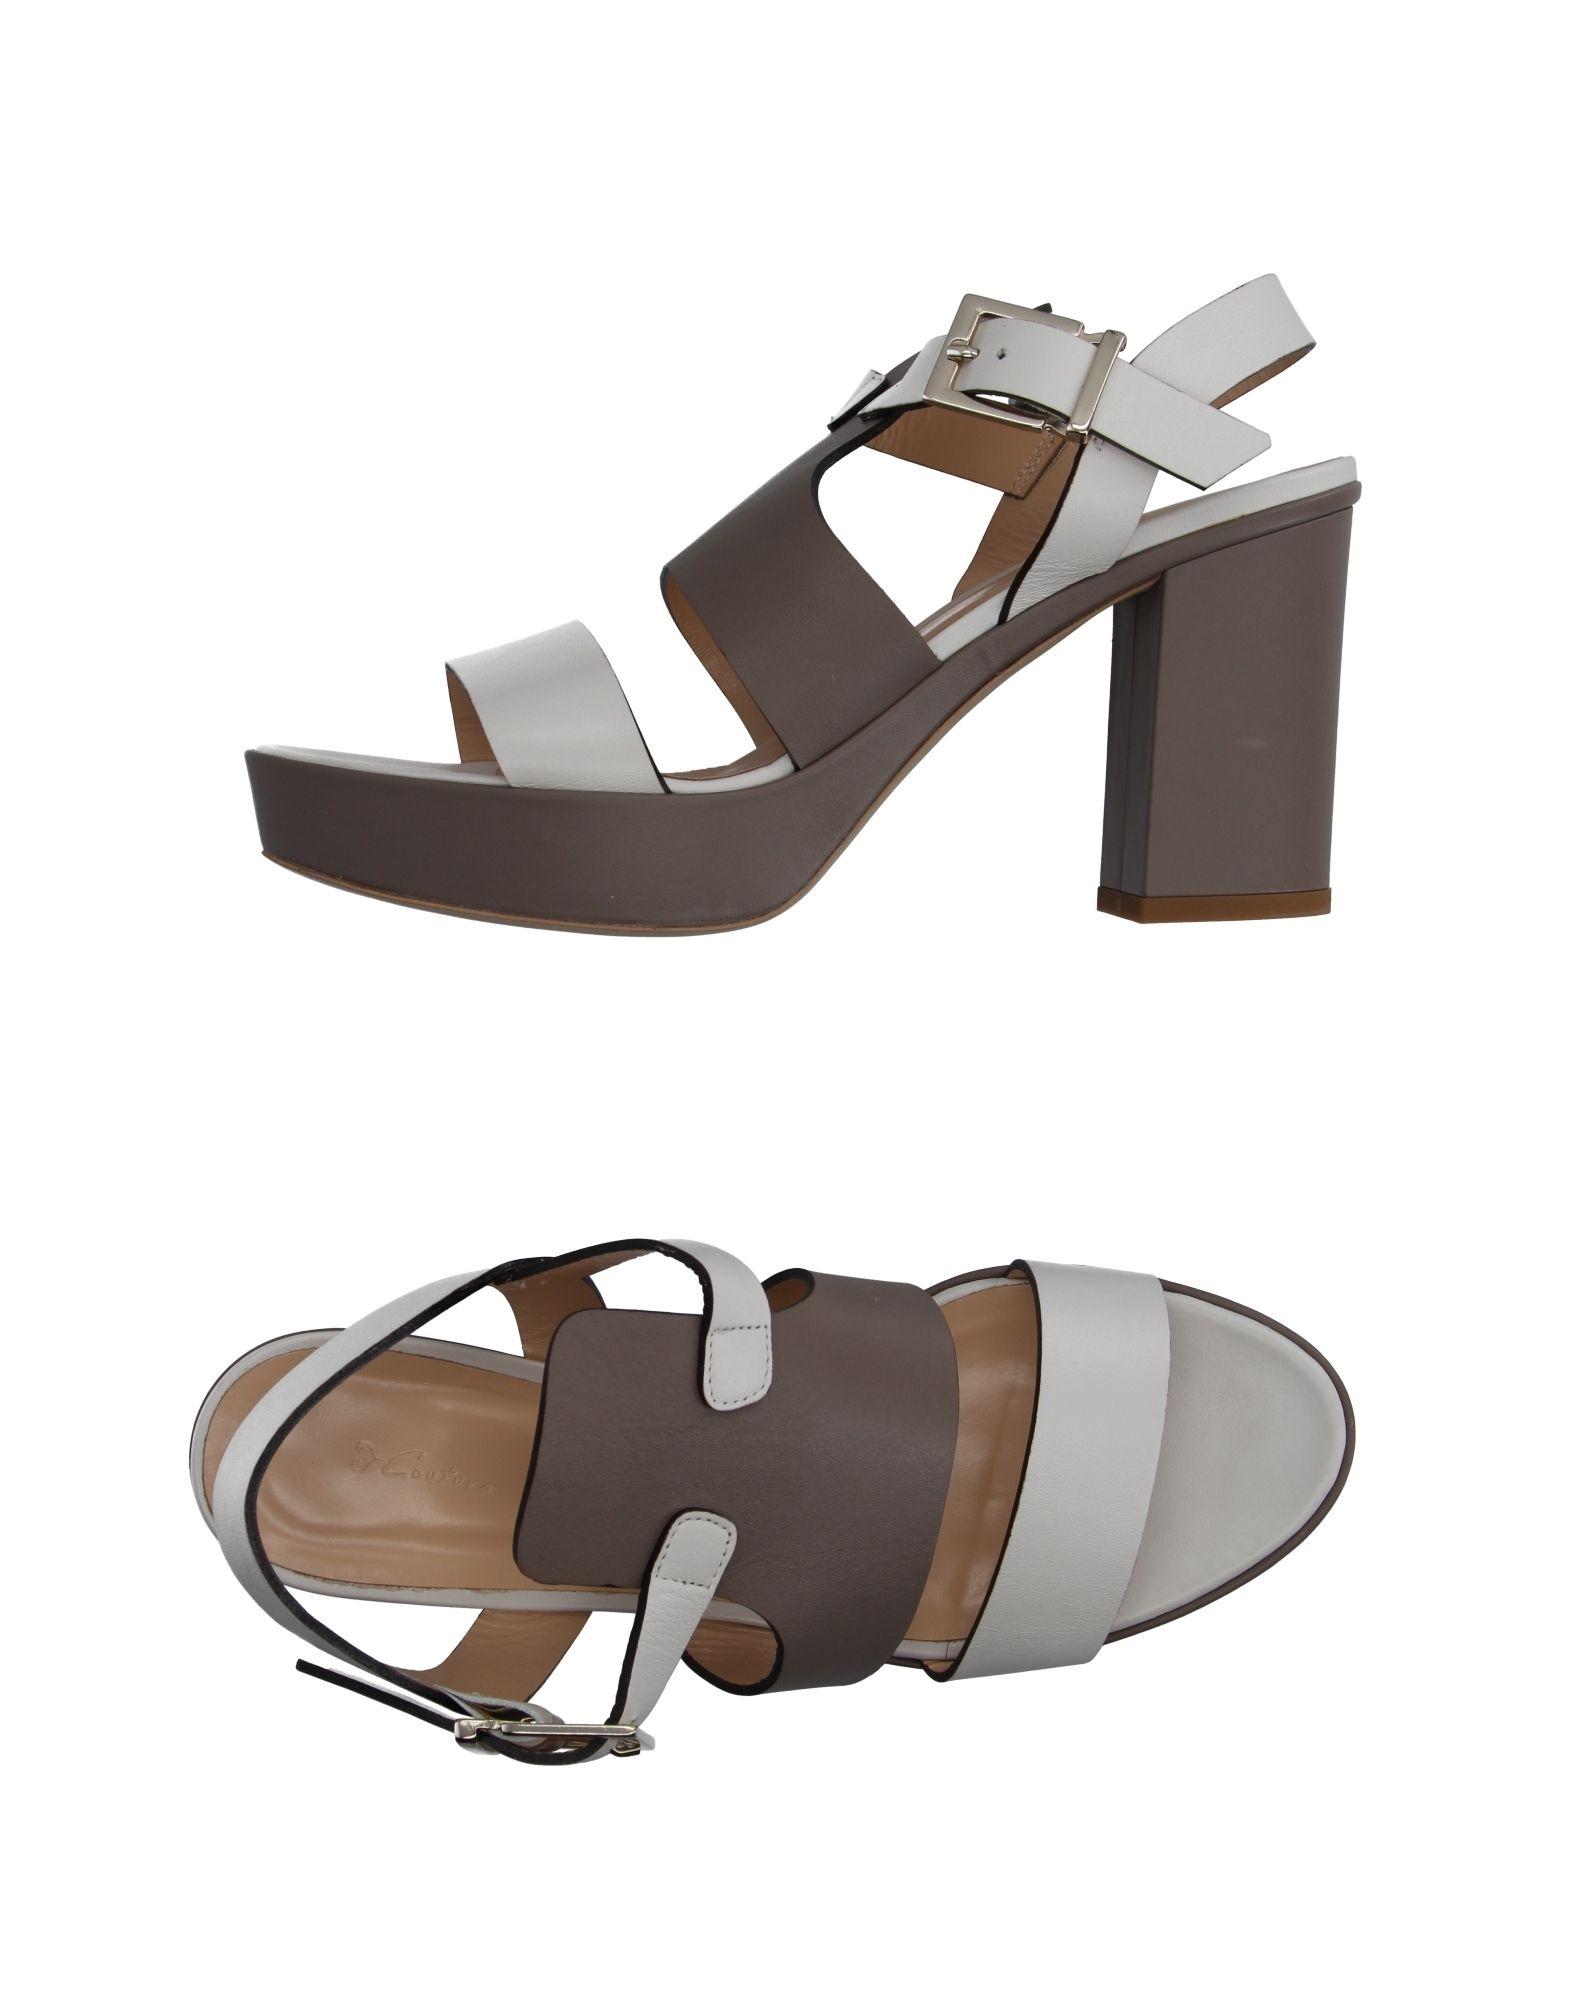 Couture Sandalen Damen  11137963LC Gute Qualität beliebte Schuhe